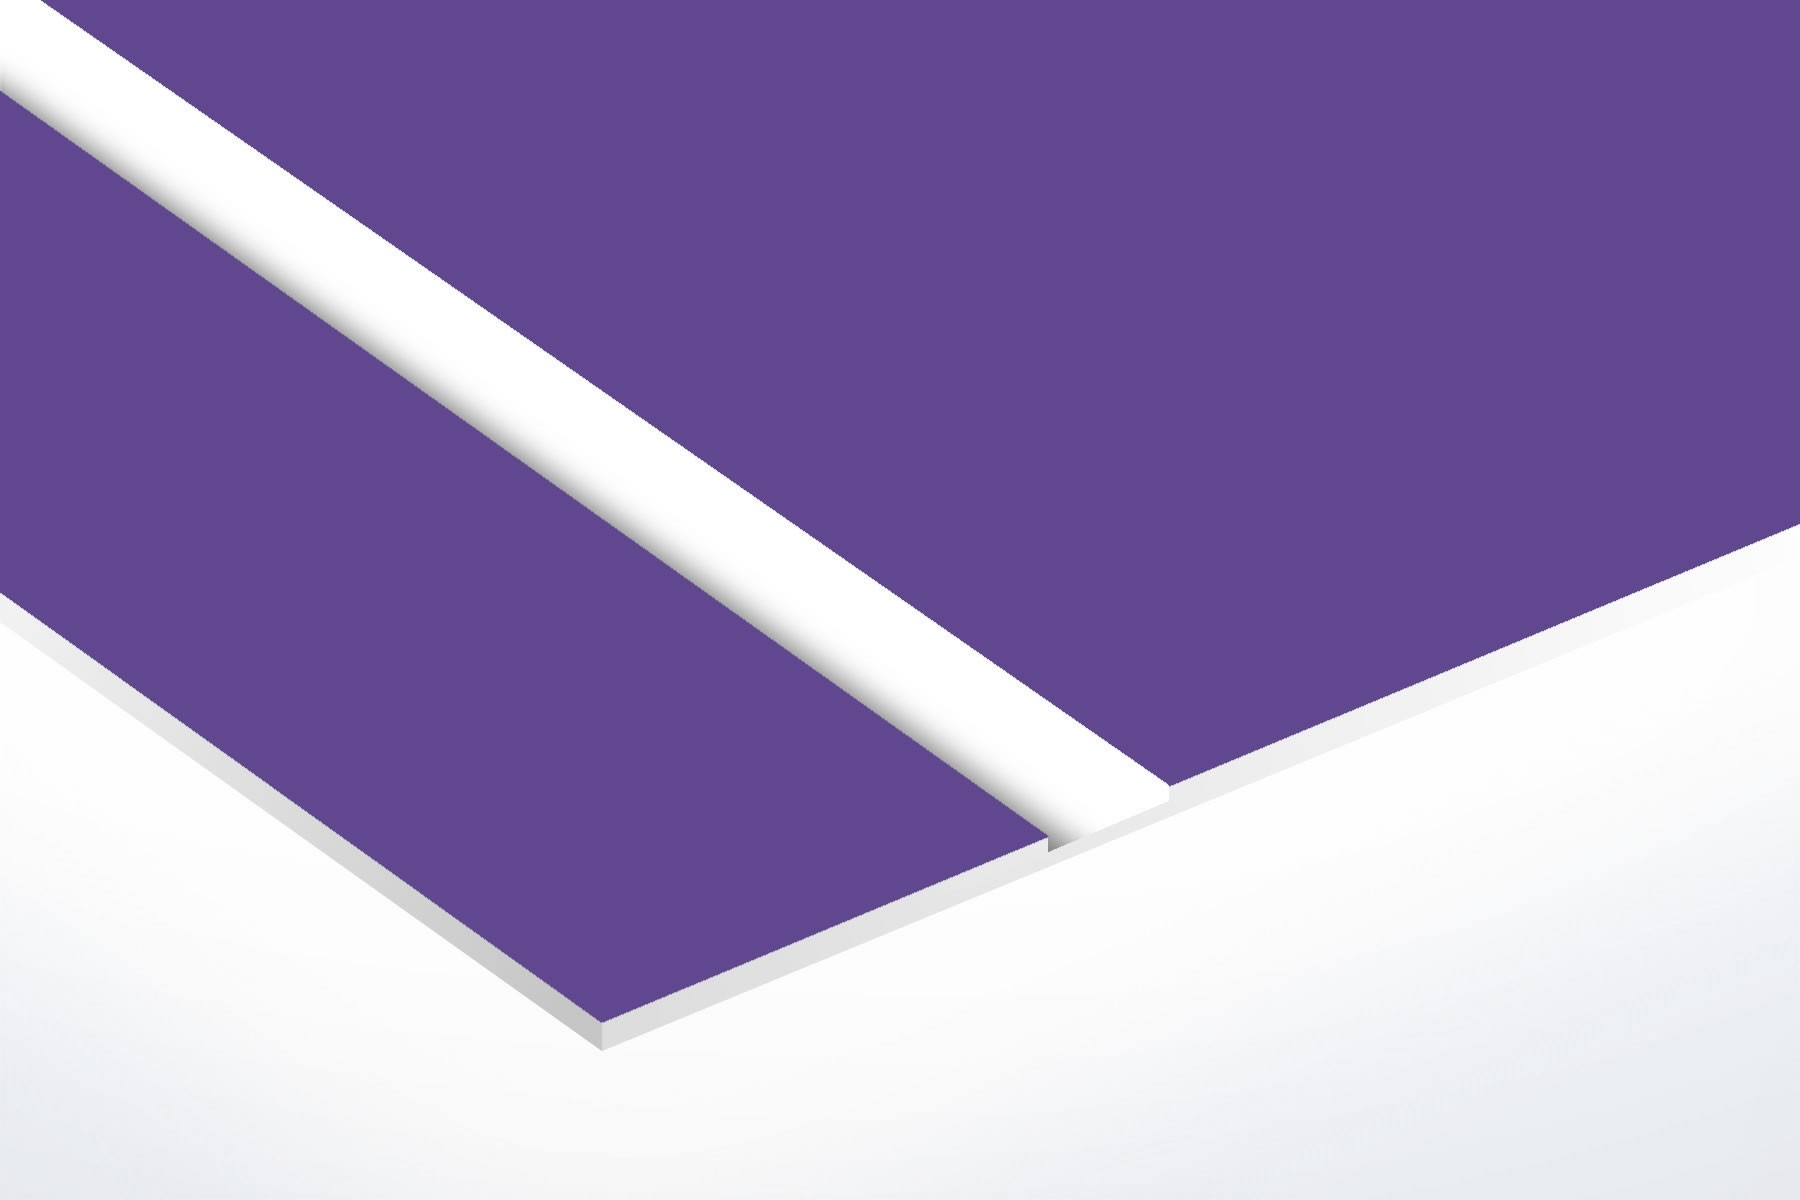 TroLase Lights,Purple/White, 2ply, 0.1 mm